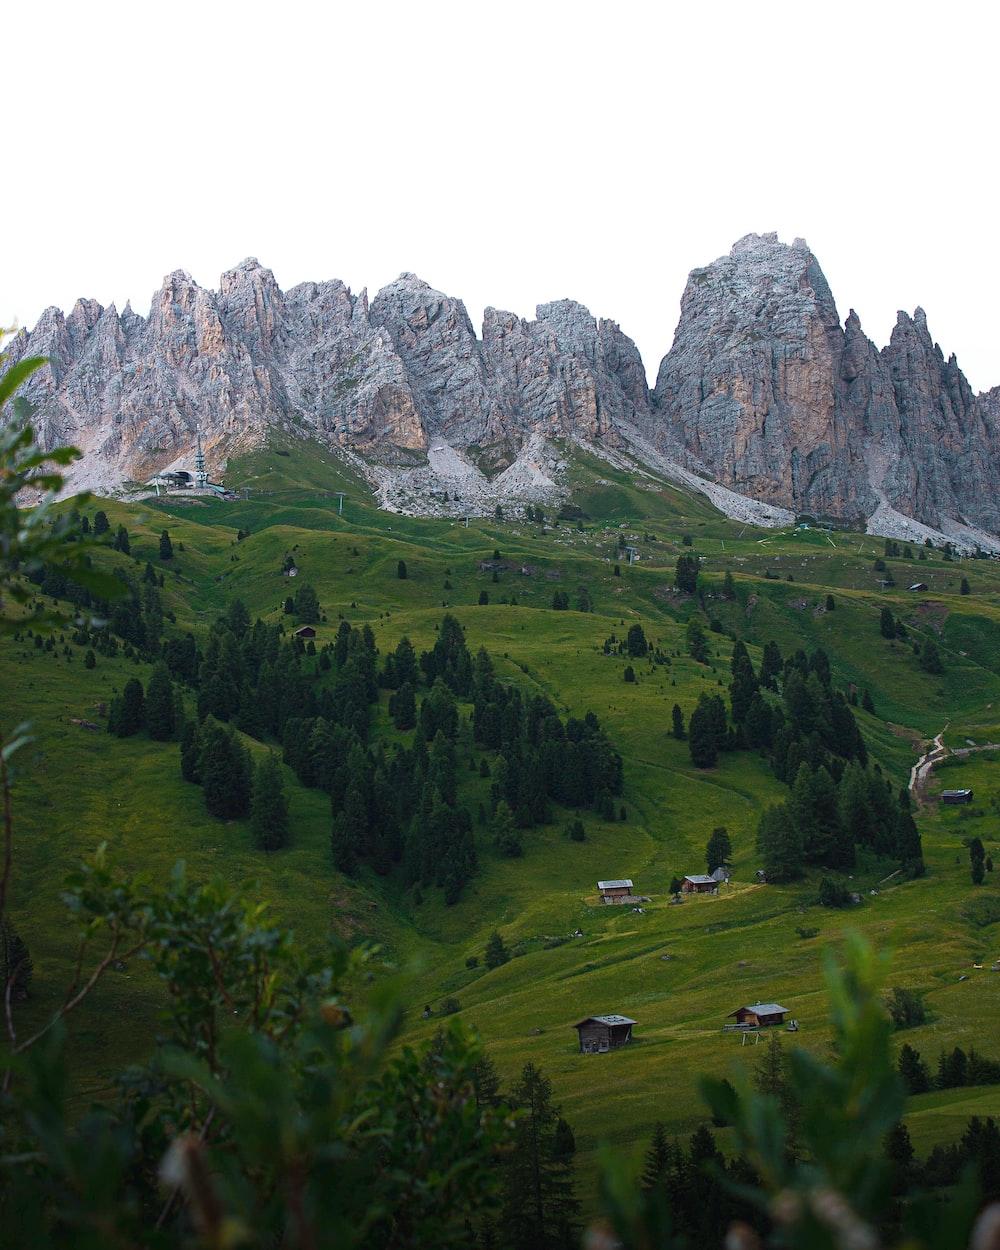 green grass field near brown rocky mountain during daytime